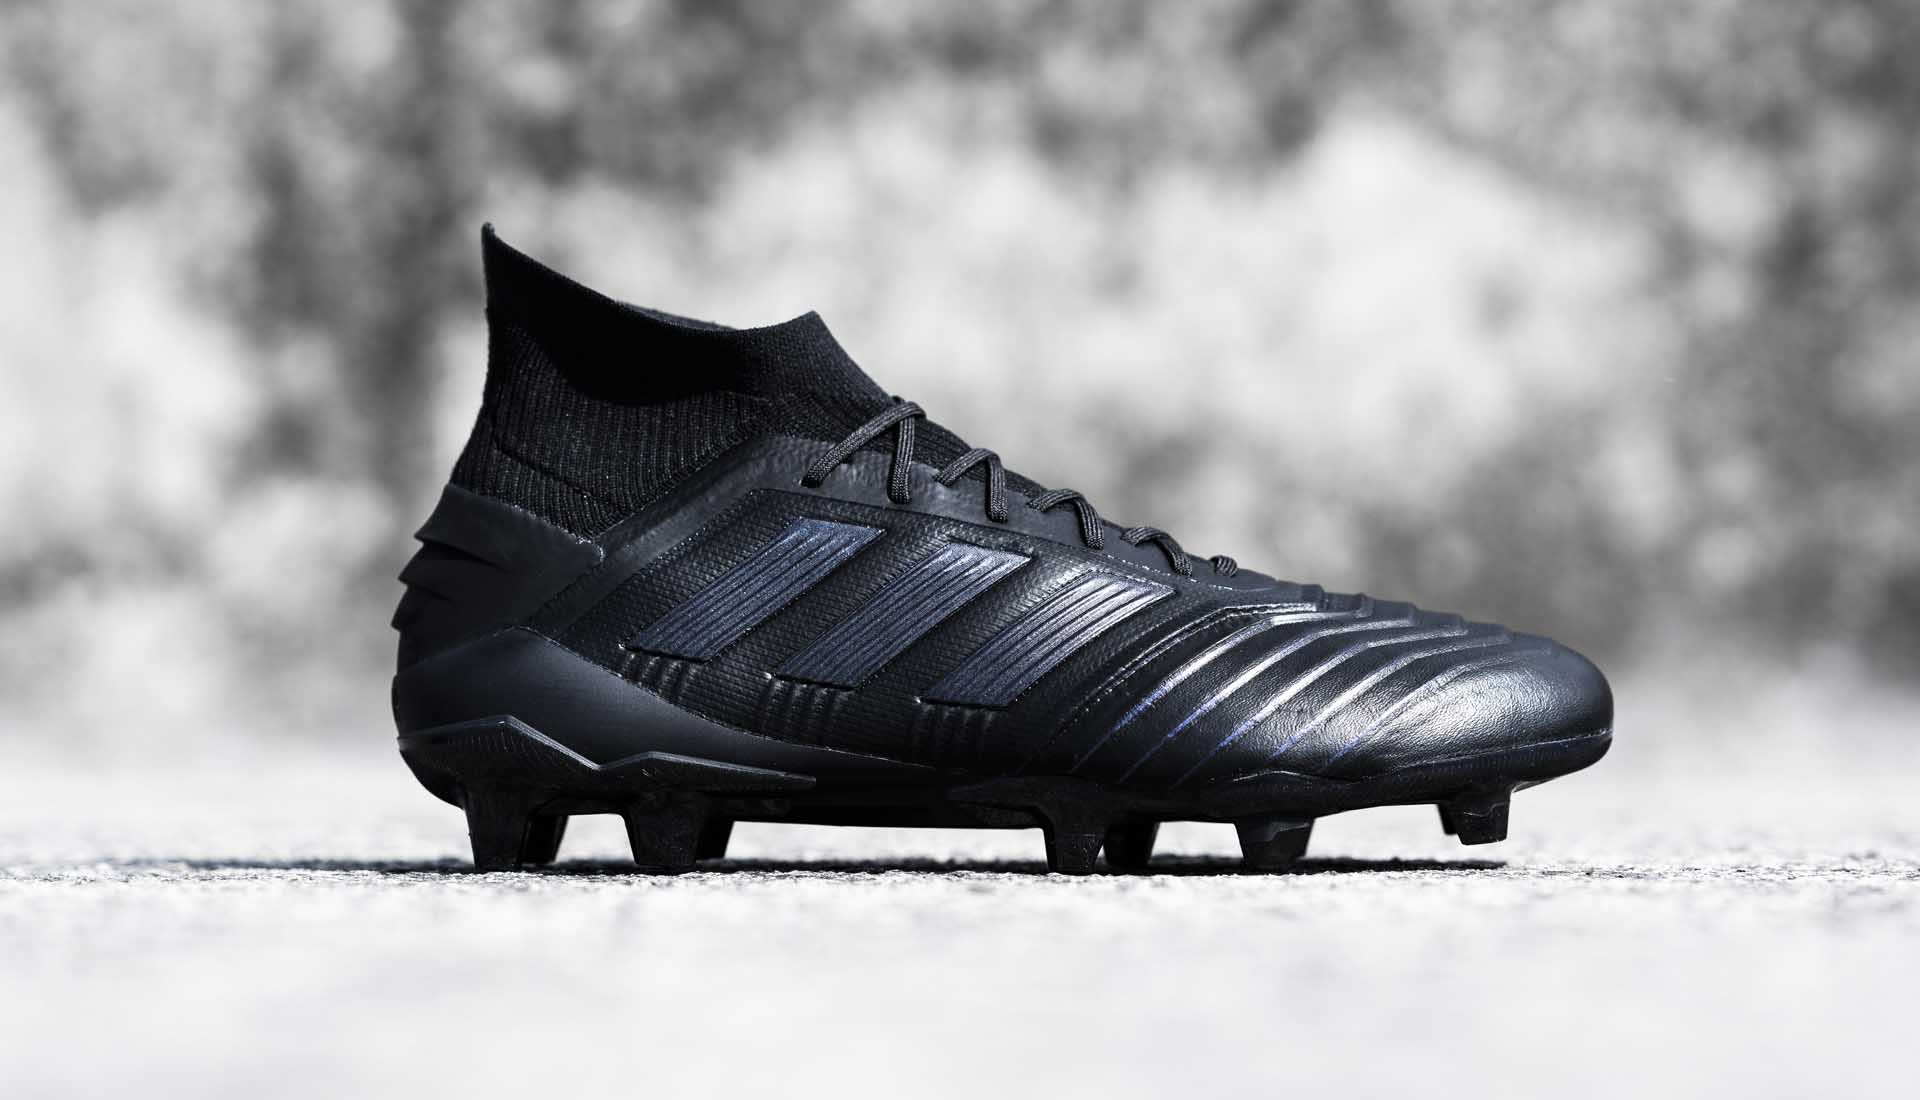 adidas Predator 19.1 FG Leather Soccer Cleats | Soccer Village